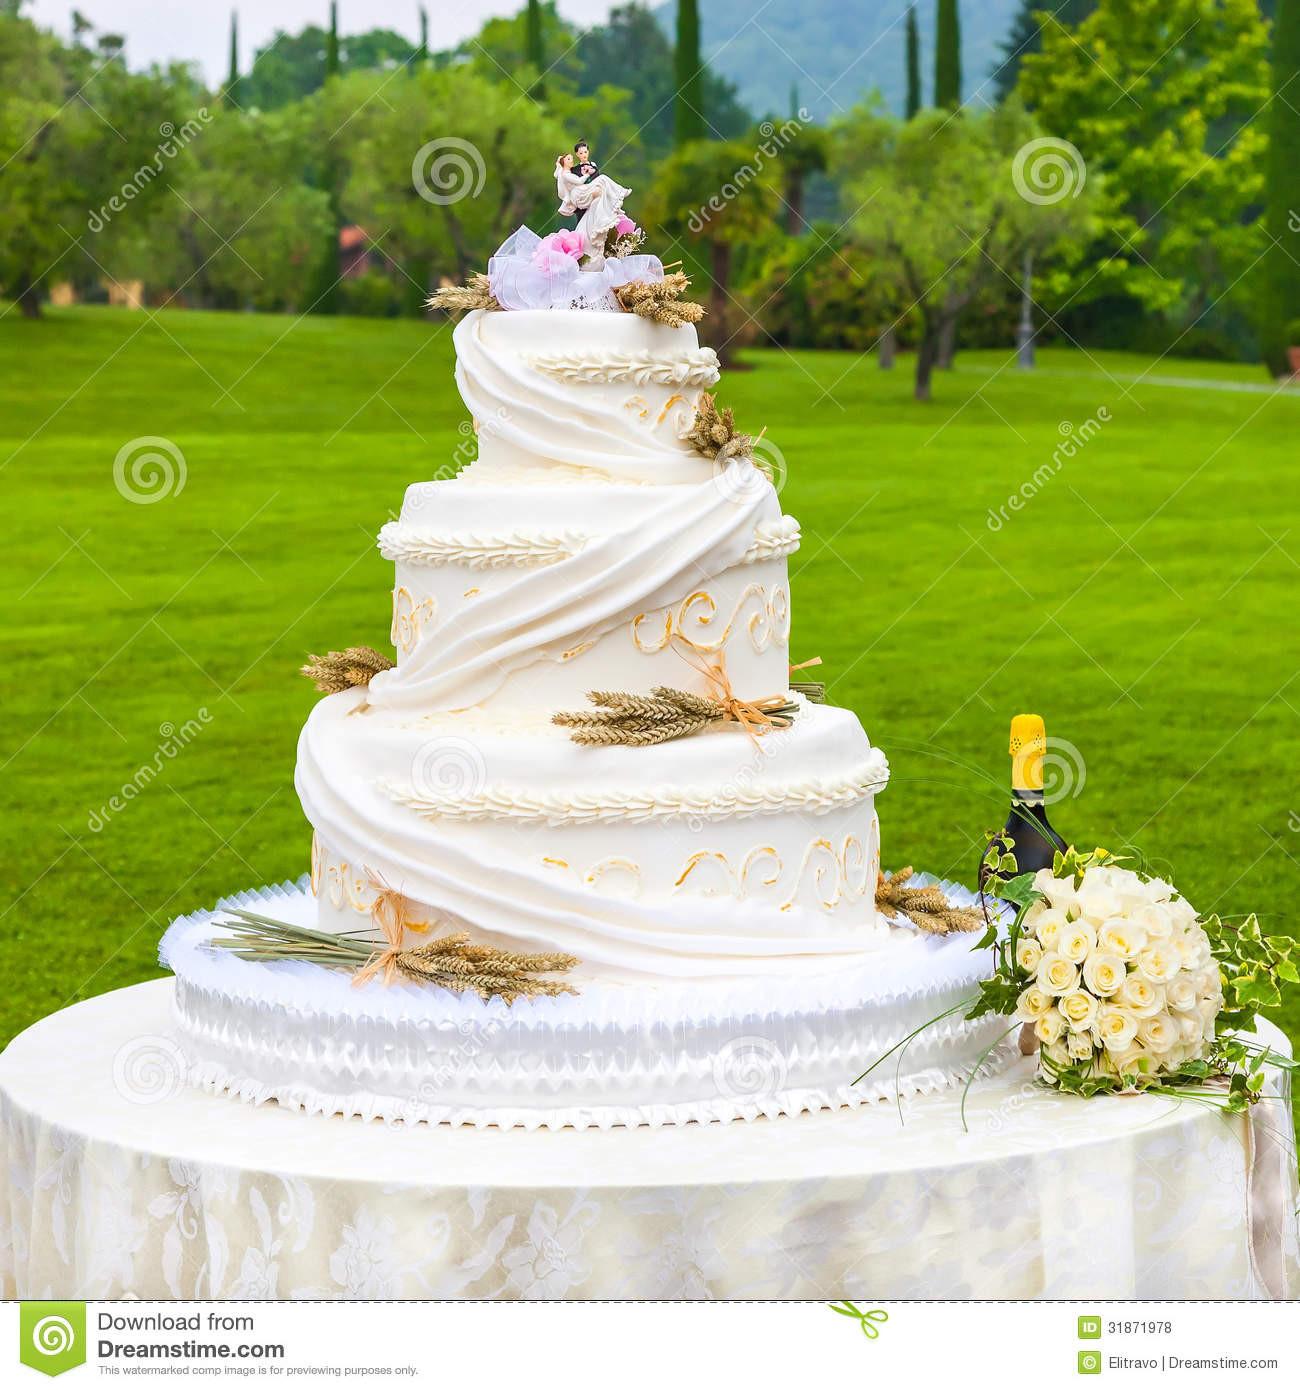 Outdoor Wedding Cakes  Outdoor wedding cake idea in 2017